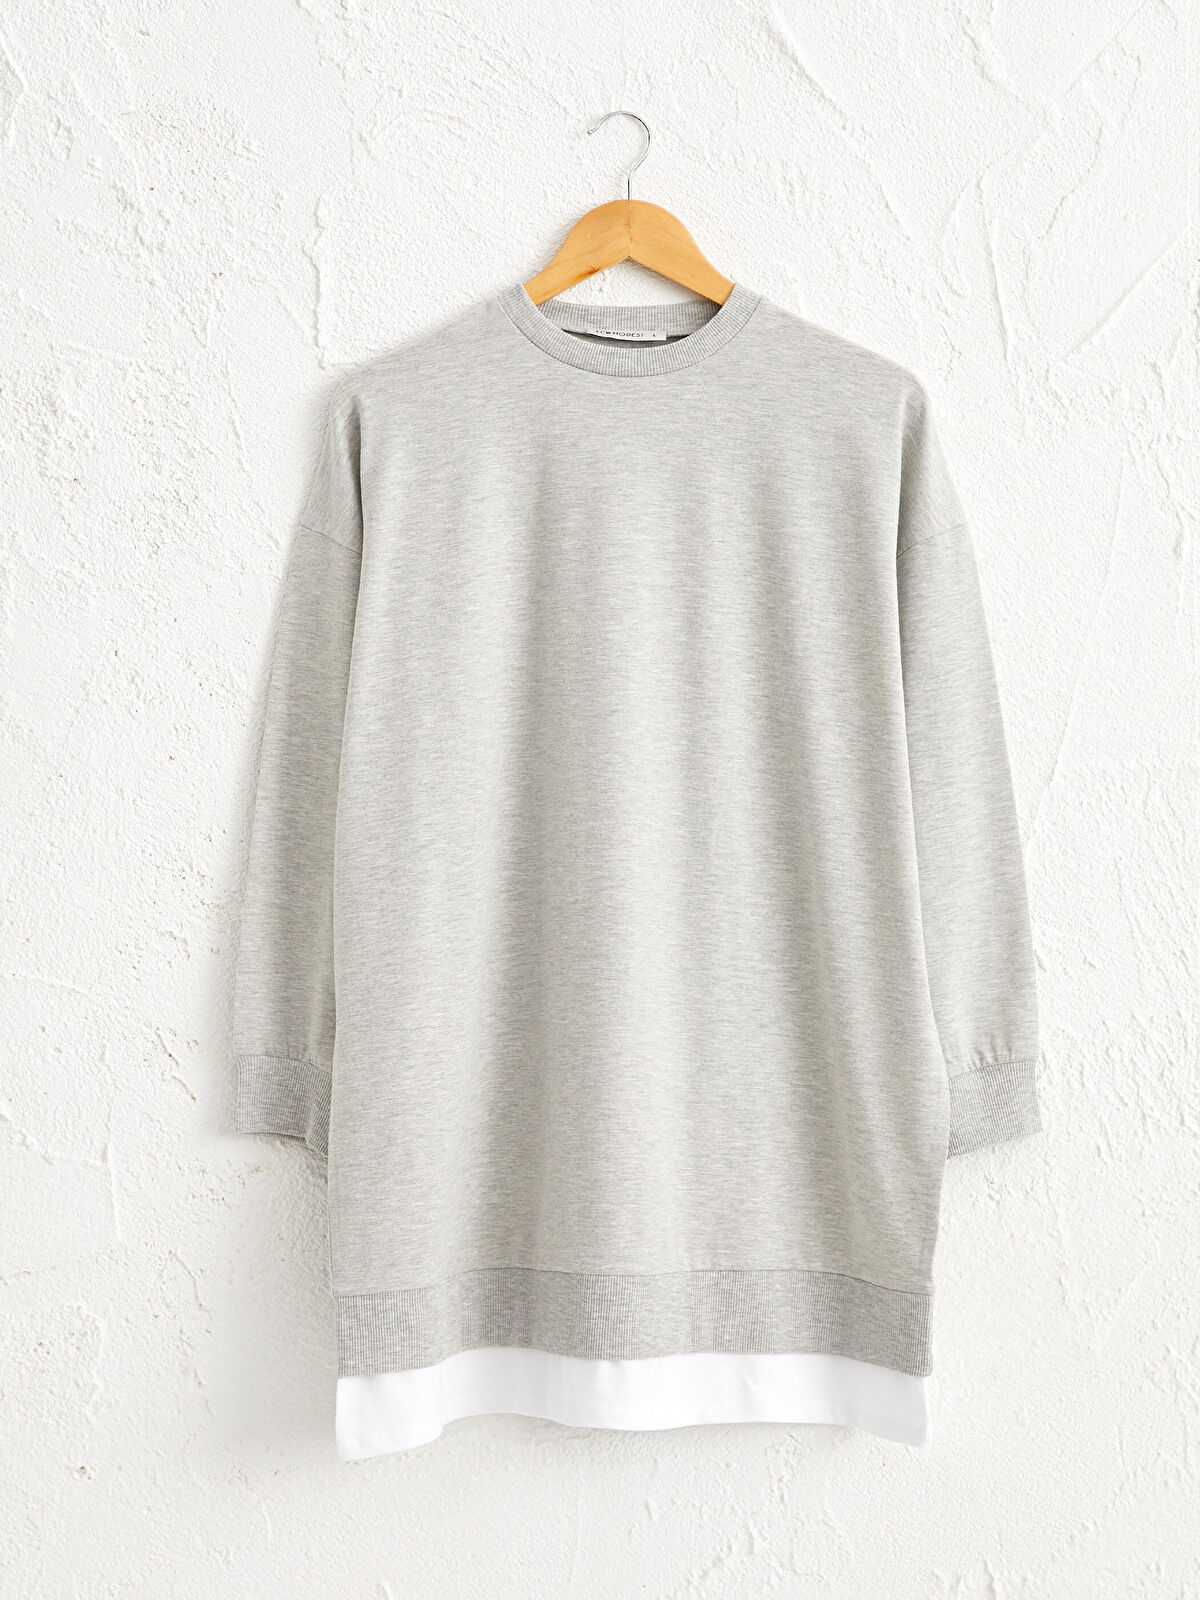 Baskı Detaylı Pamuklu Sweatshirt - LC WAIKIKI